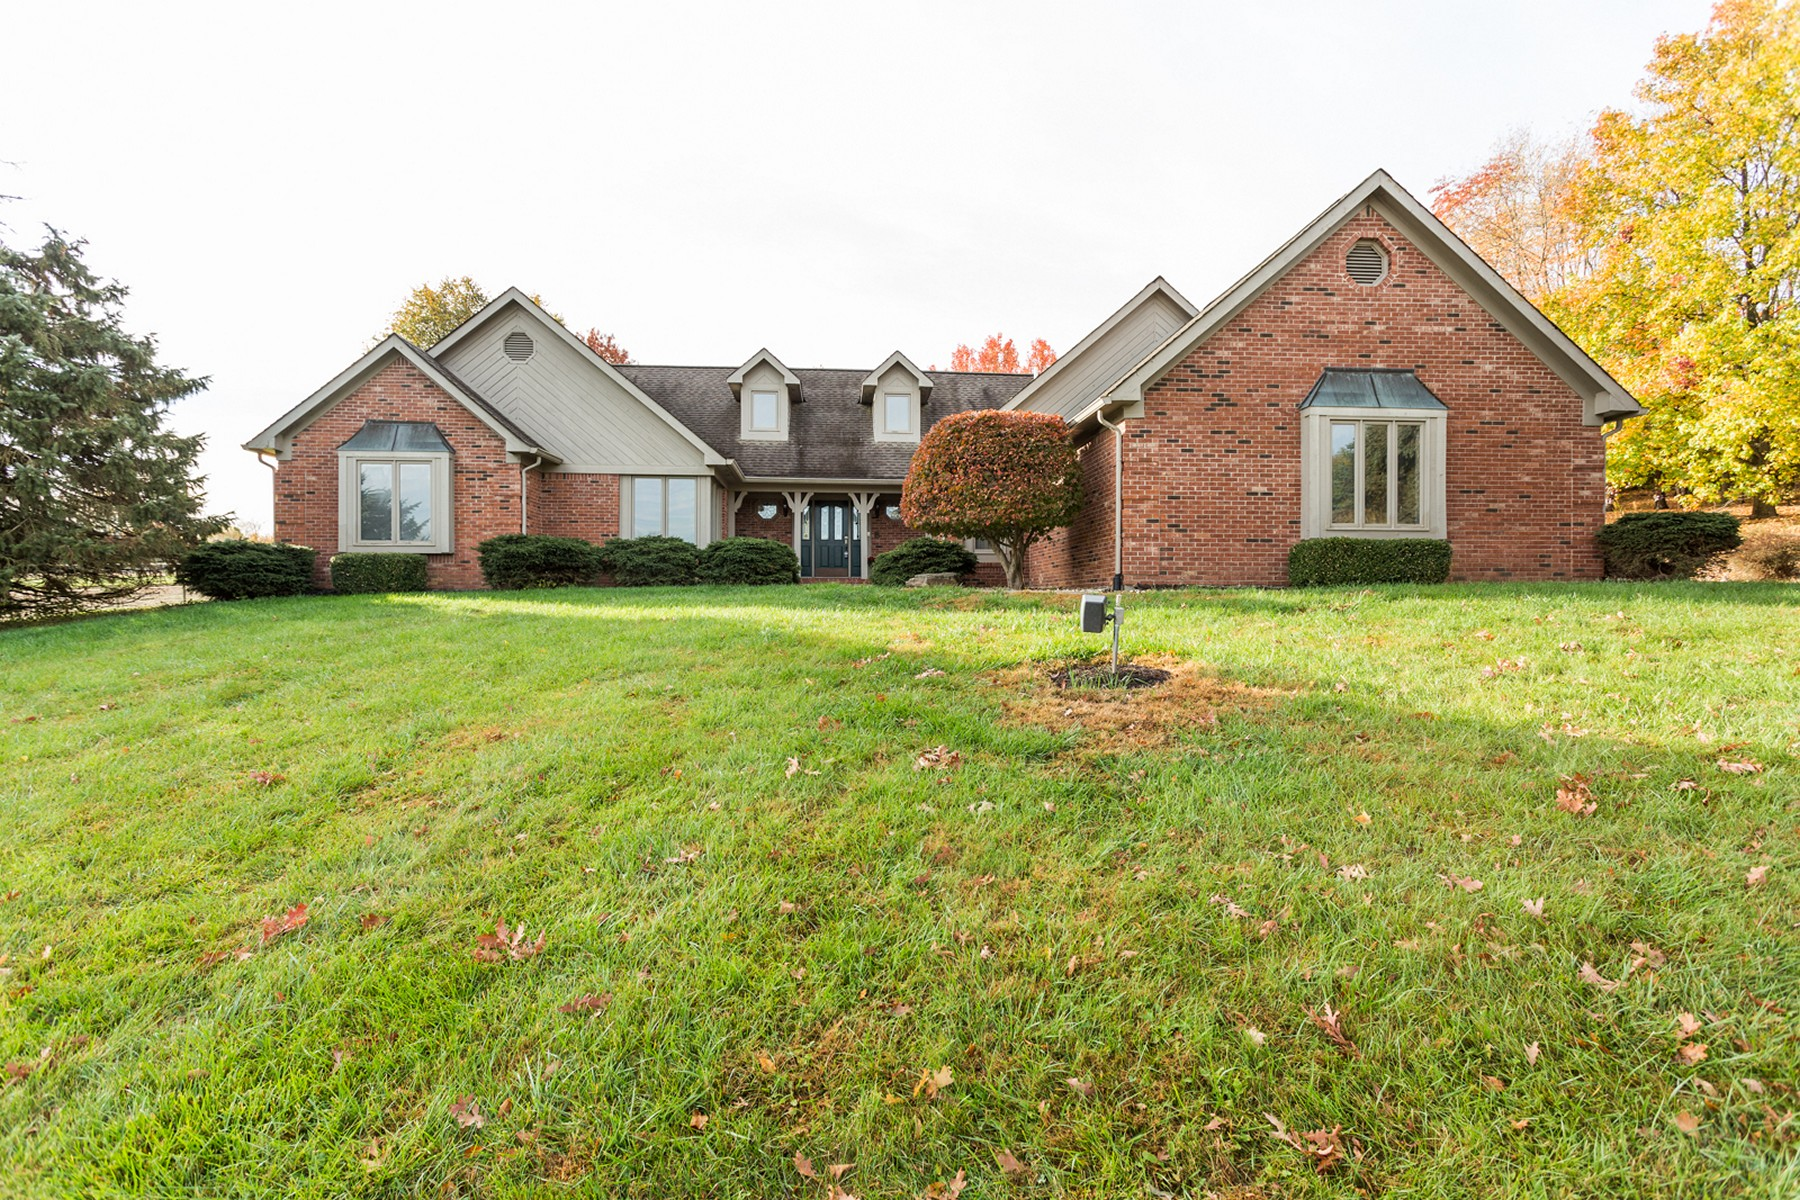 Moradia para Venda às Greenwood Estate 6555 W. Stones Crossing Rd Greenwood, Indiana, 46143 Estados Unidos